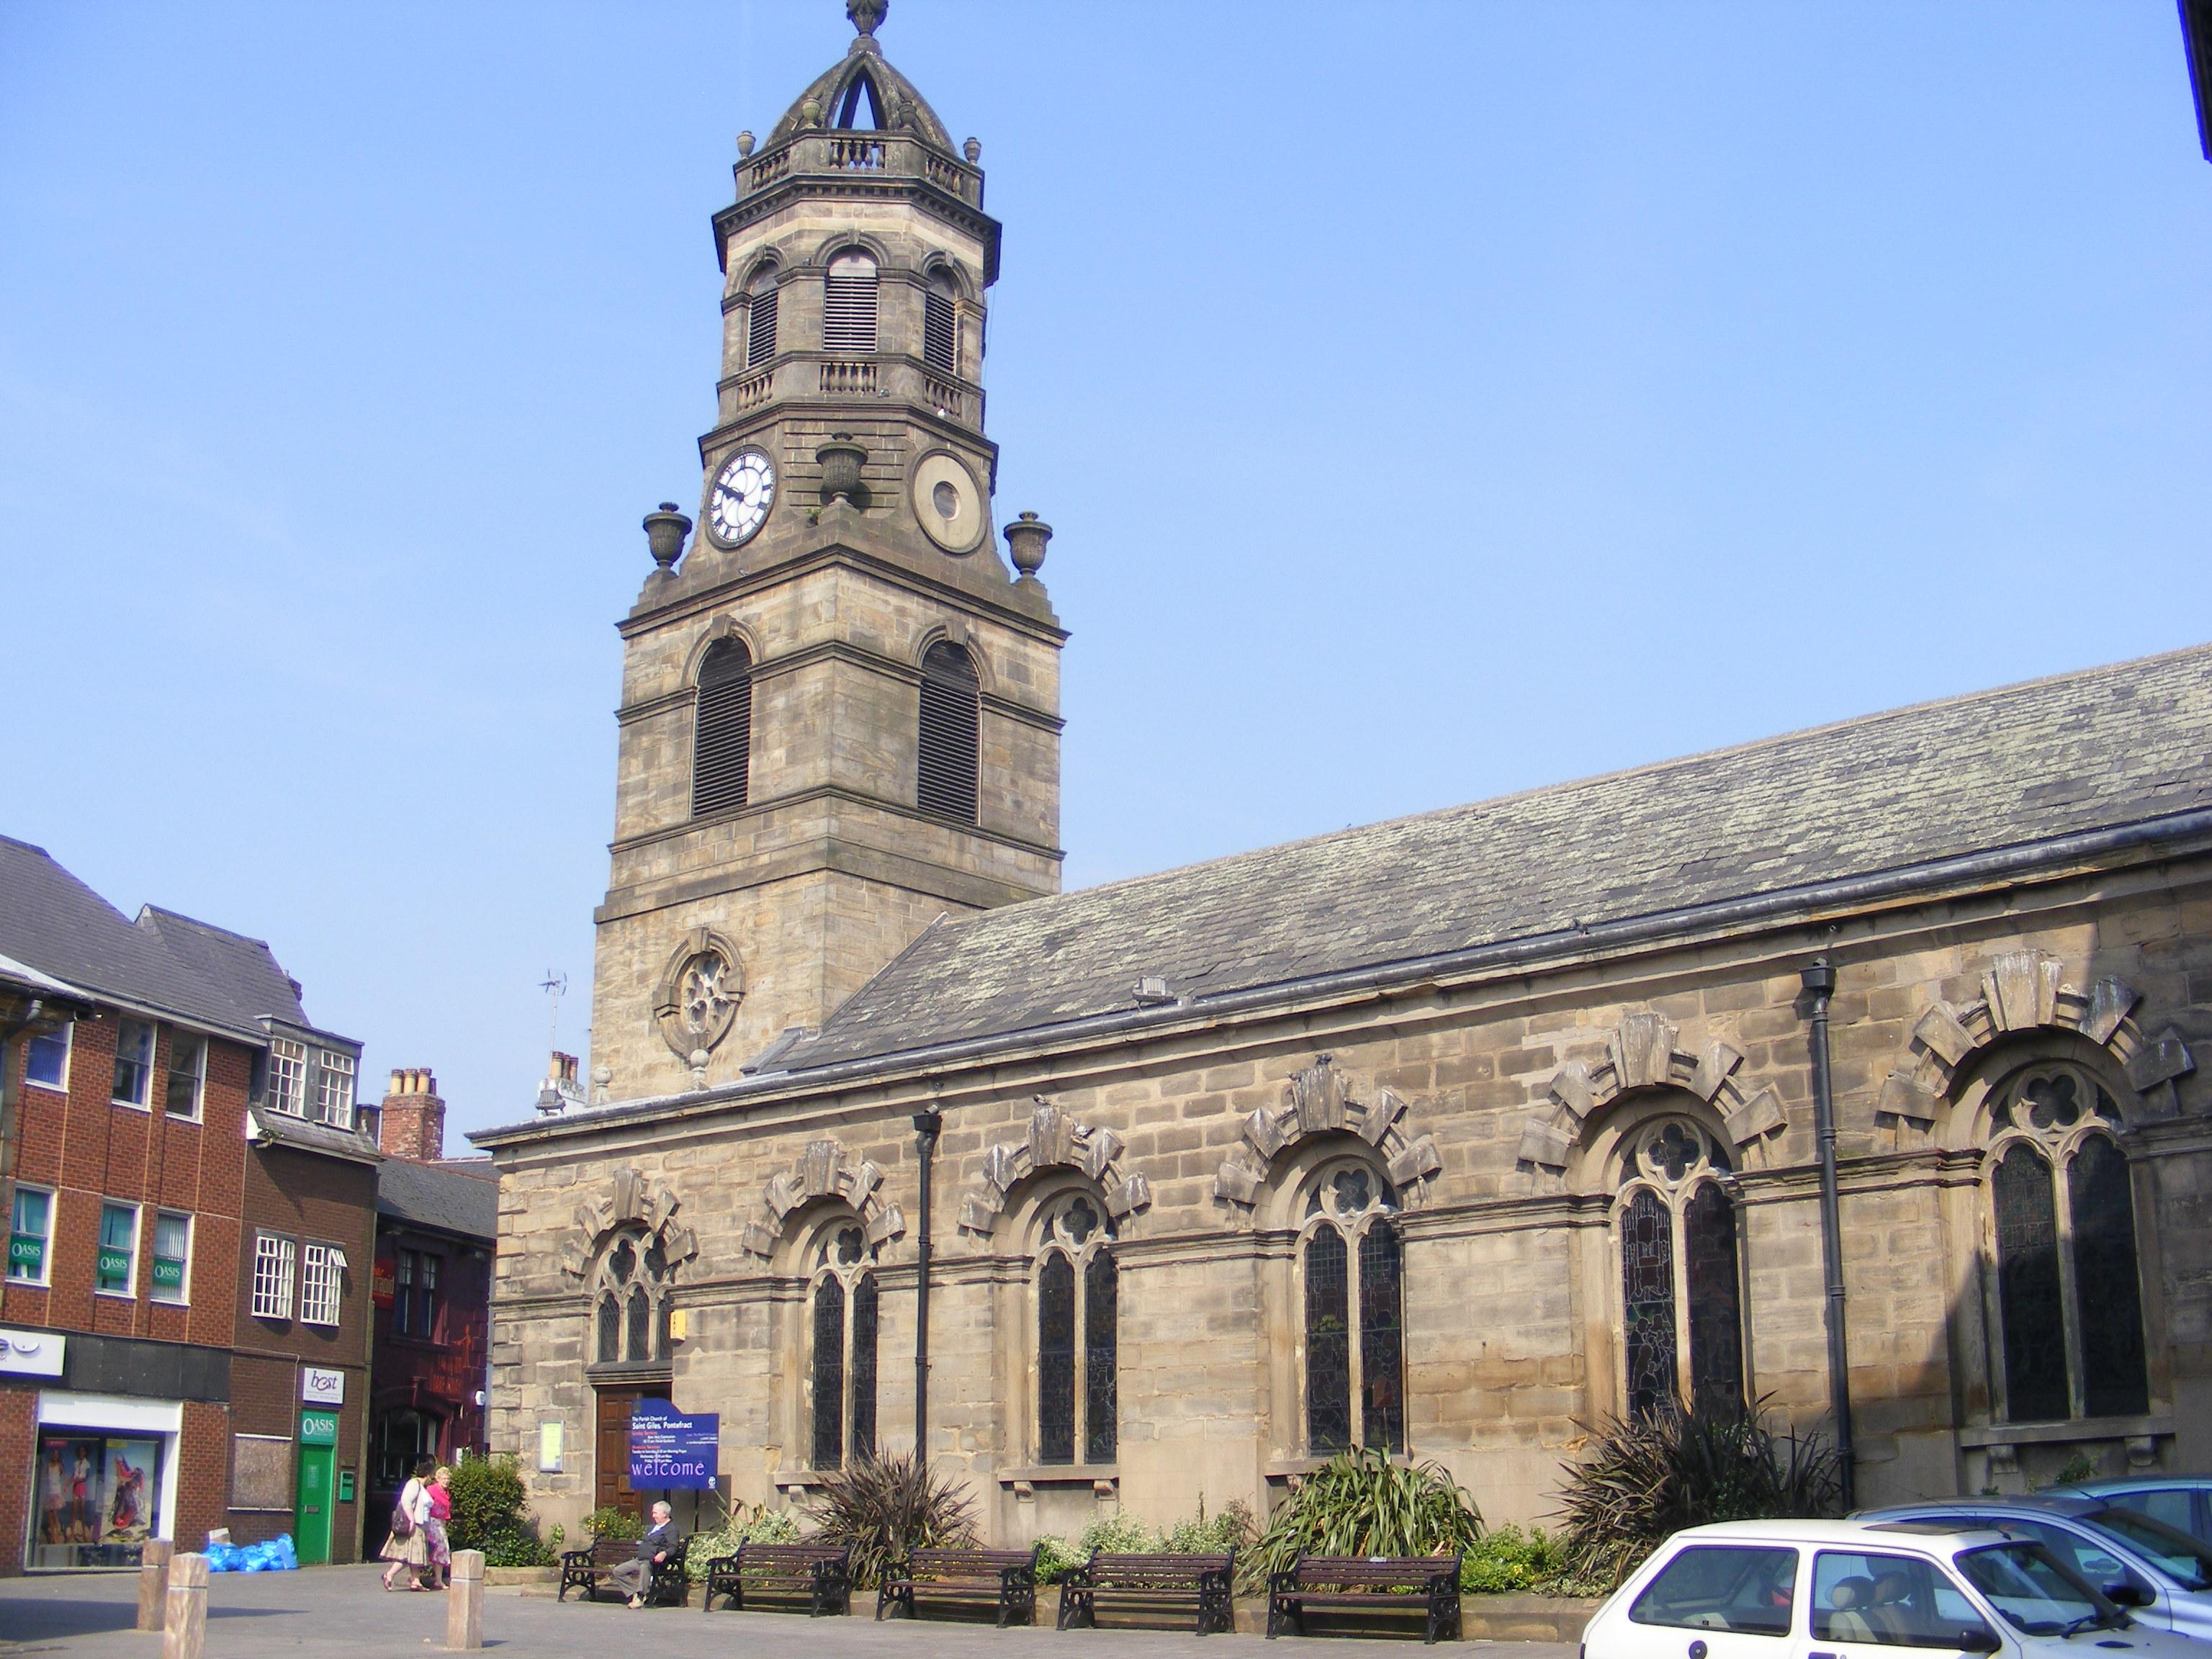 St Giles, Pontefract, Yorkshire (2010)